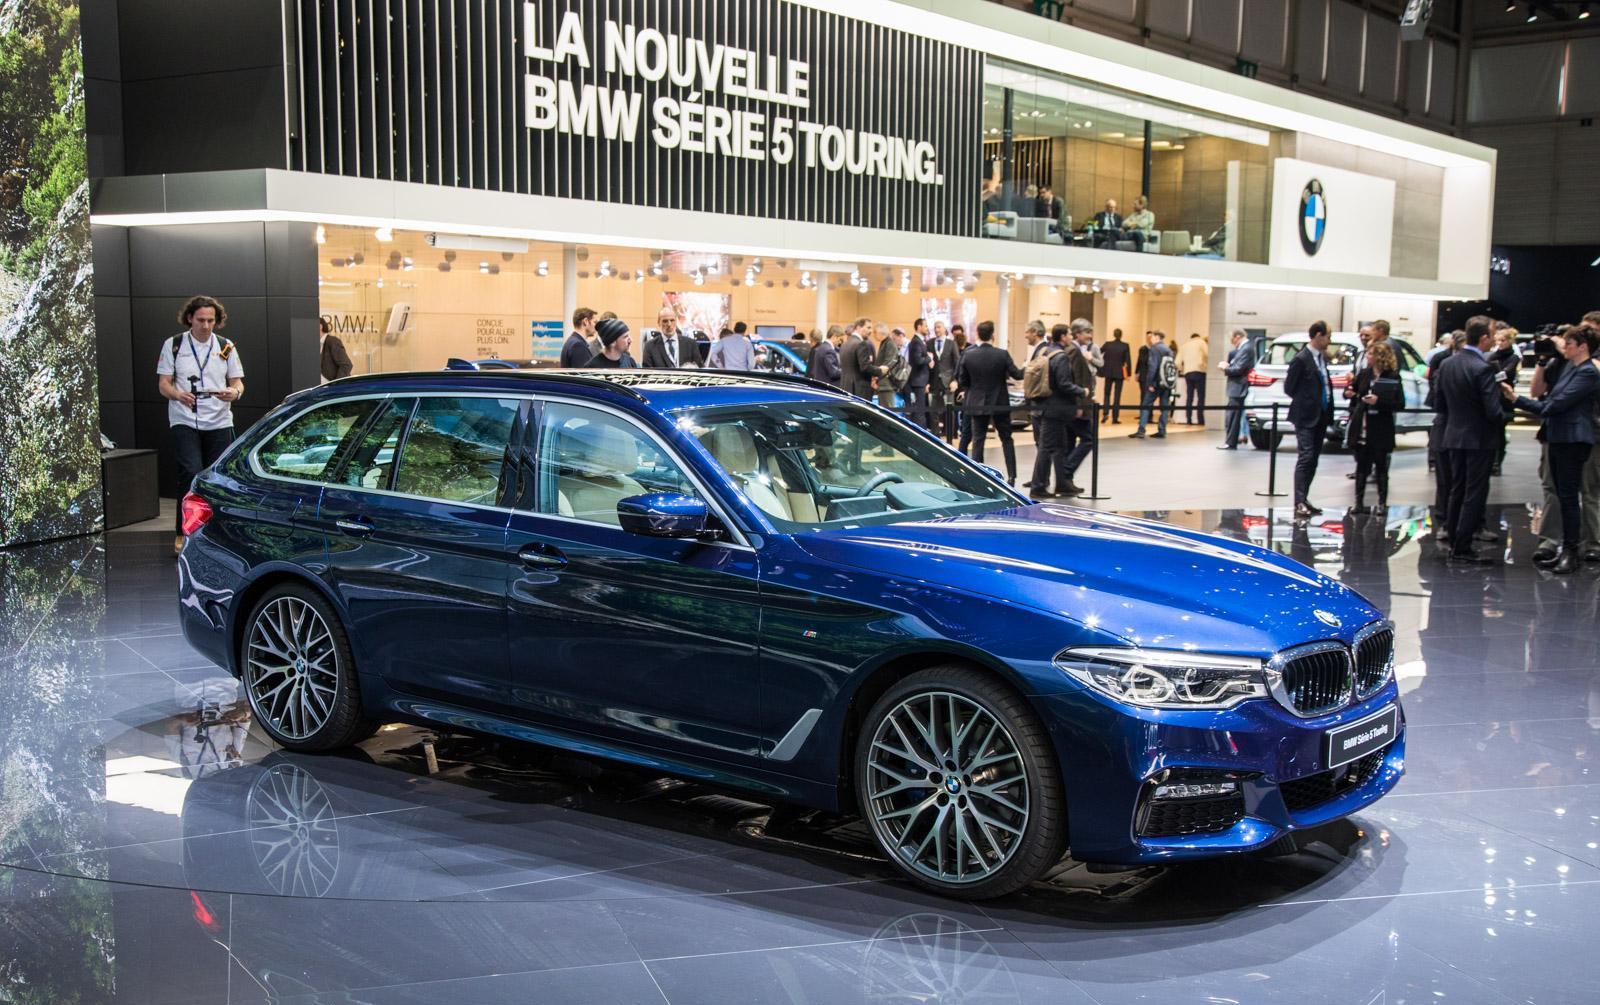 BMW-5-serie-touring-009